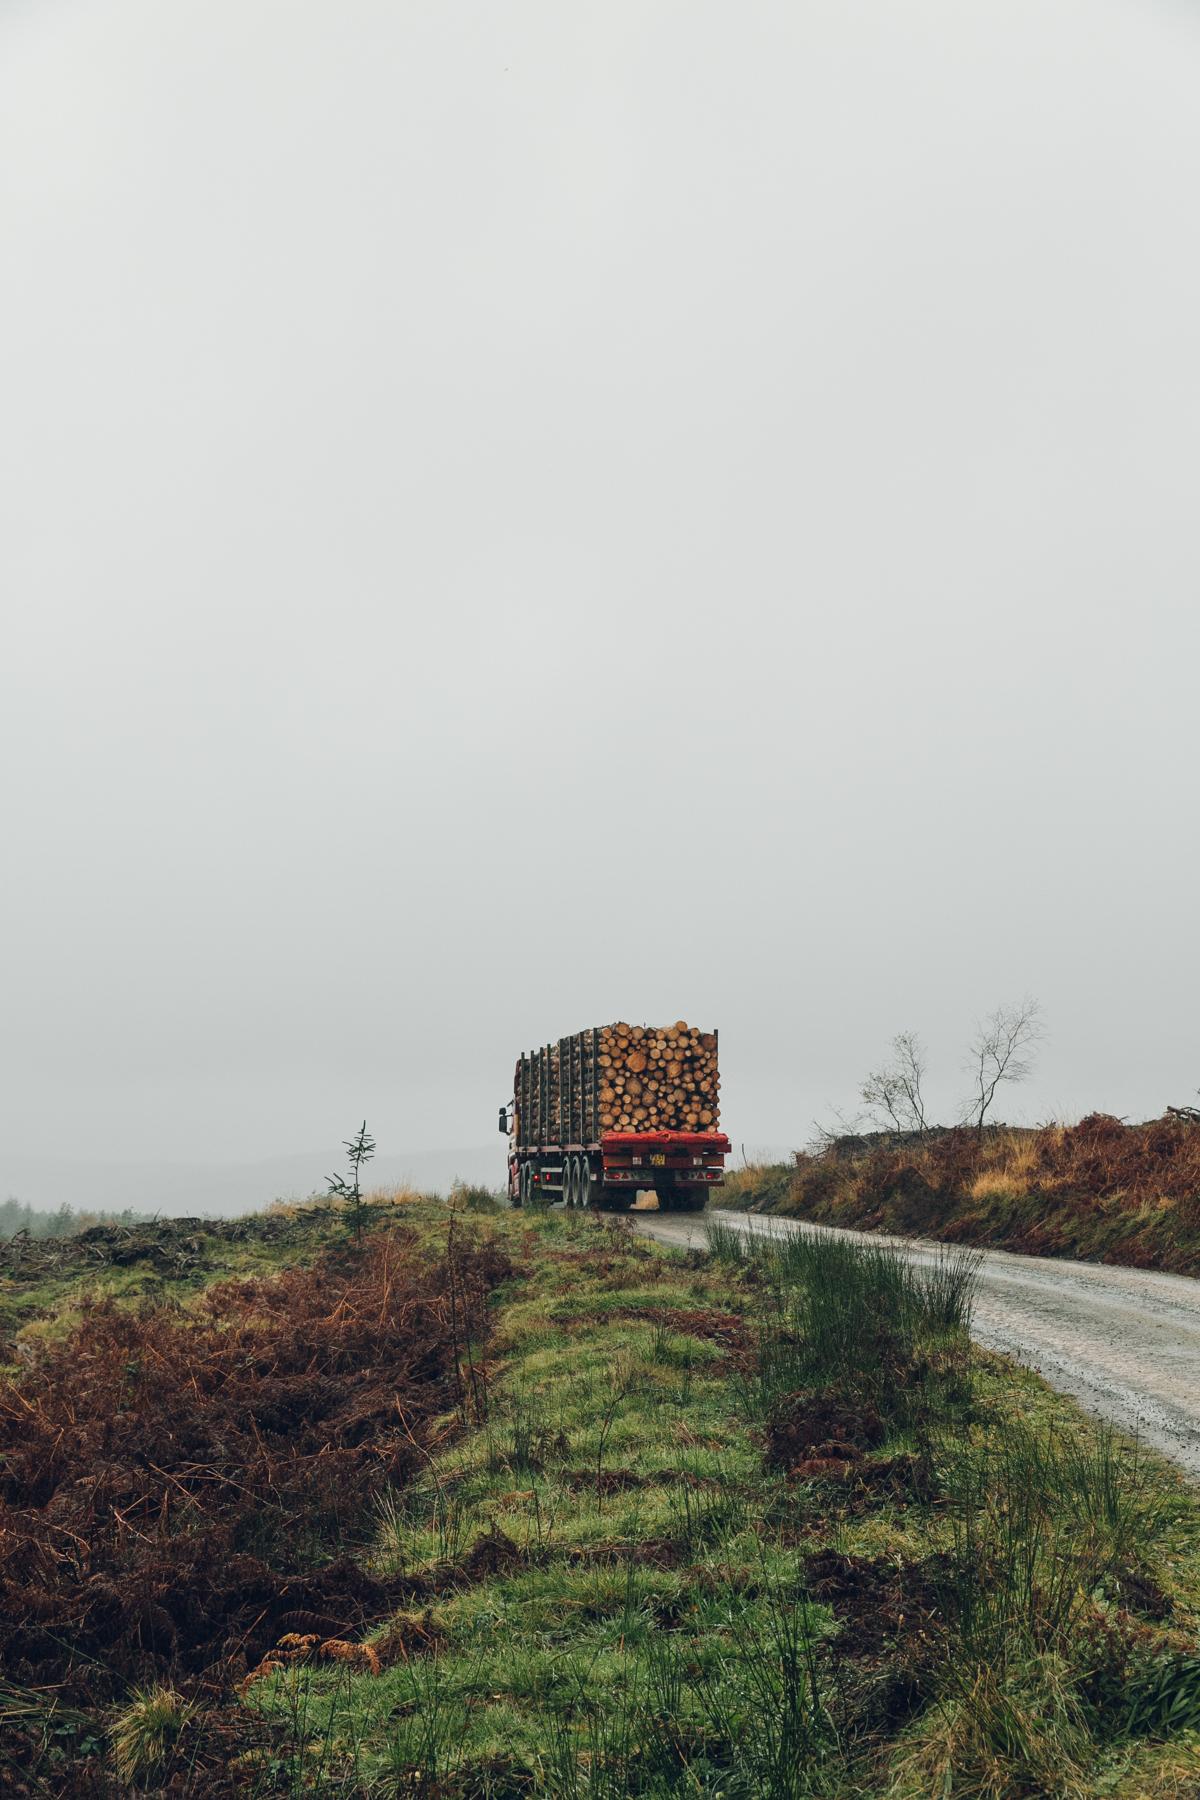 Lorry full of felled trees.